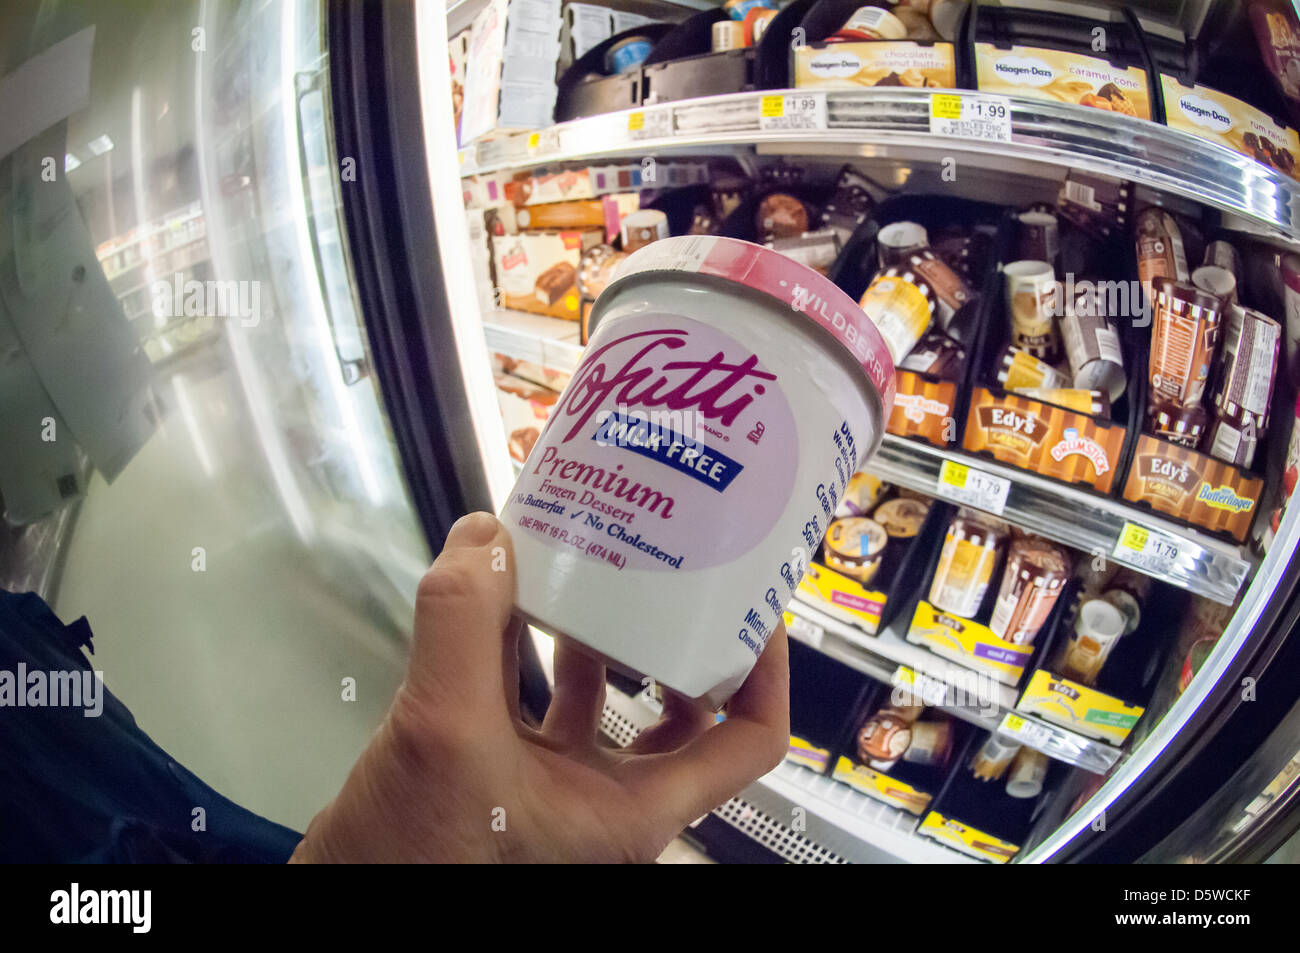 A container of Tofutti brand non-dairy frozen dessert - Stock Image